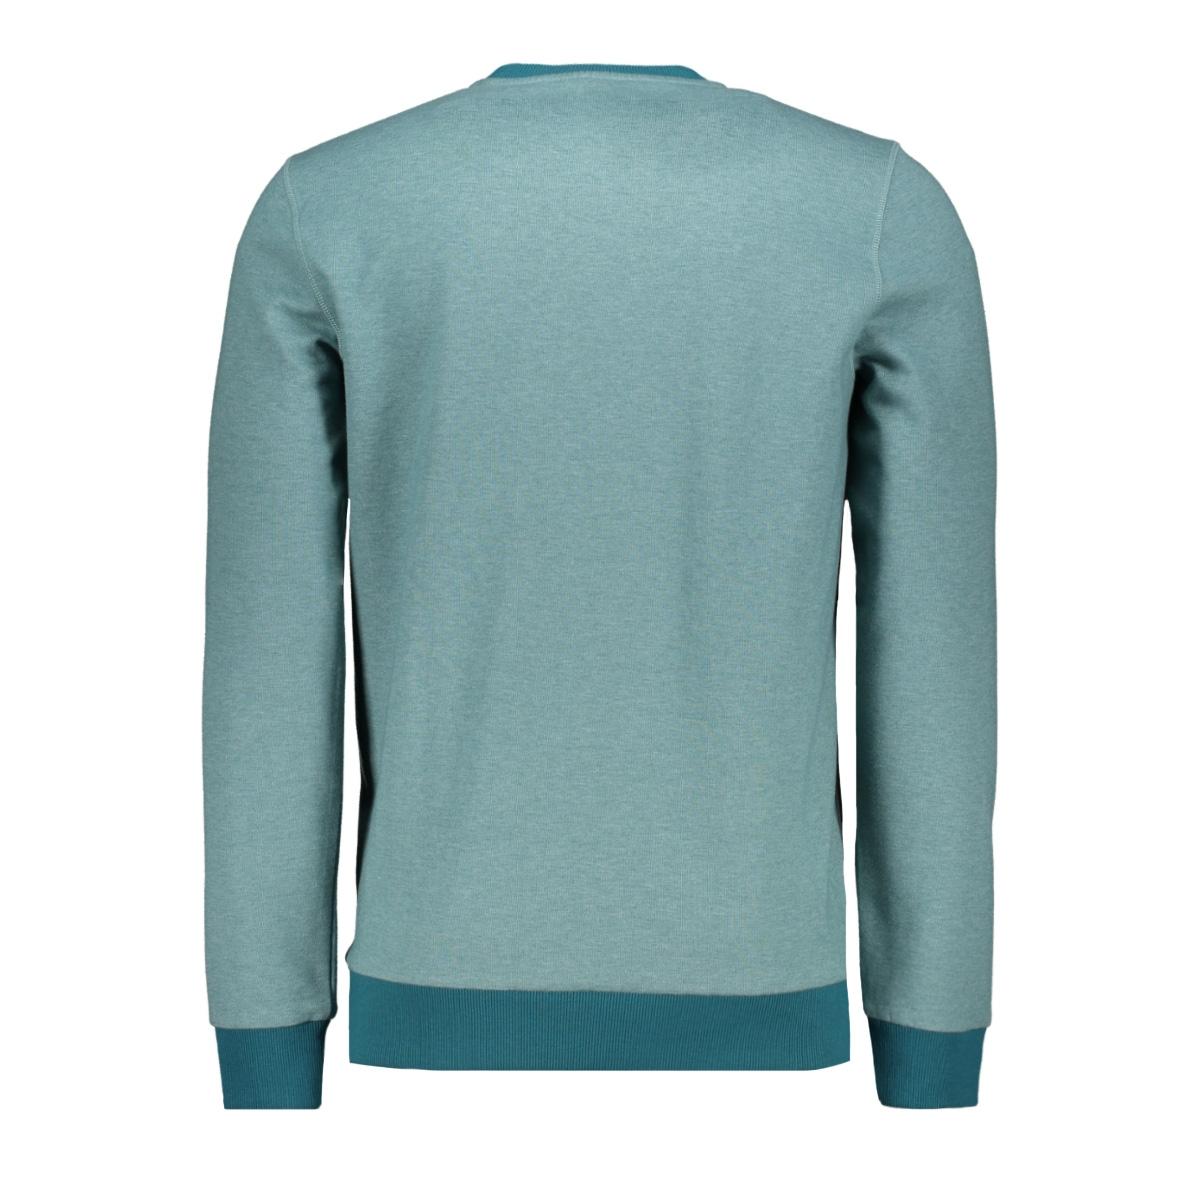 long sleeve t shirt pts197501 pme legend t-shirt 5246